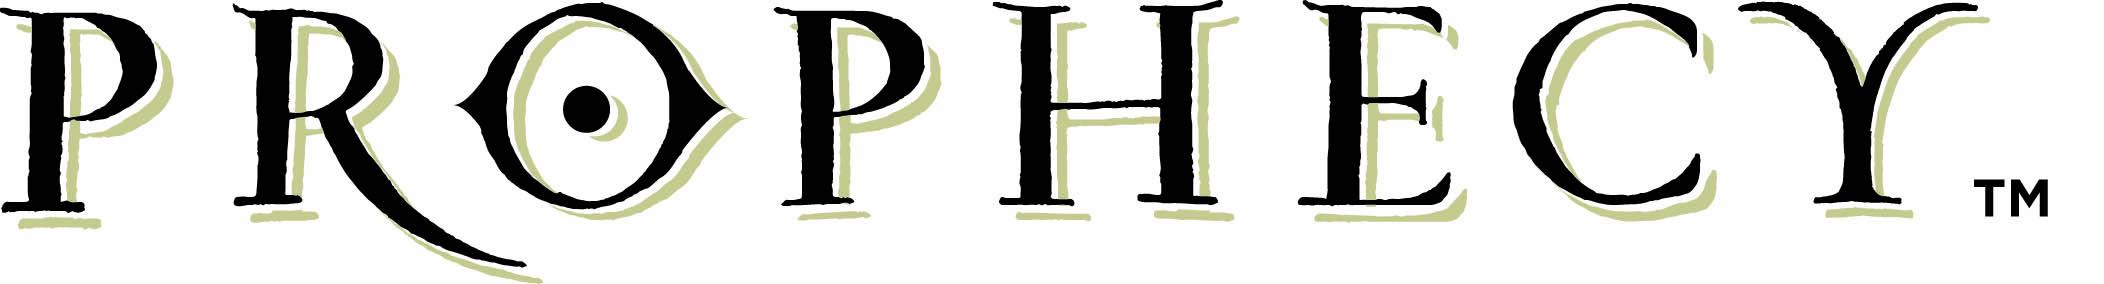 Logo Prophecy.jpg